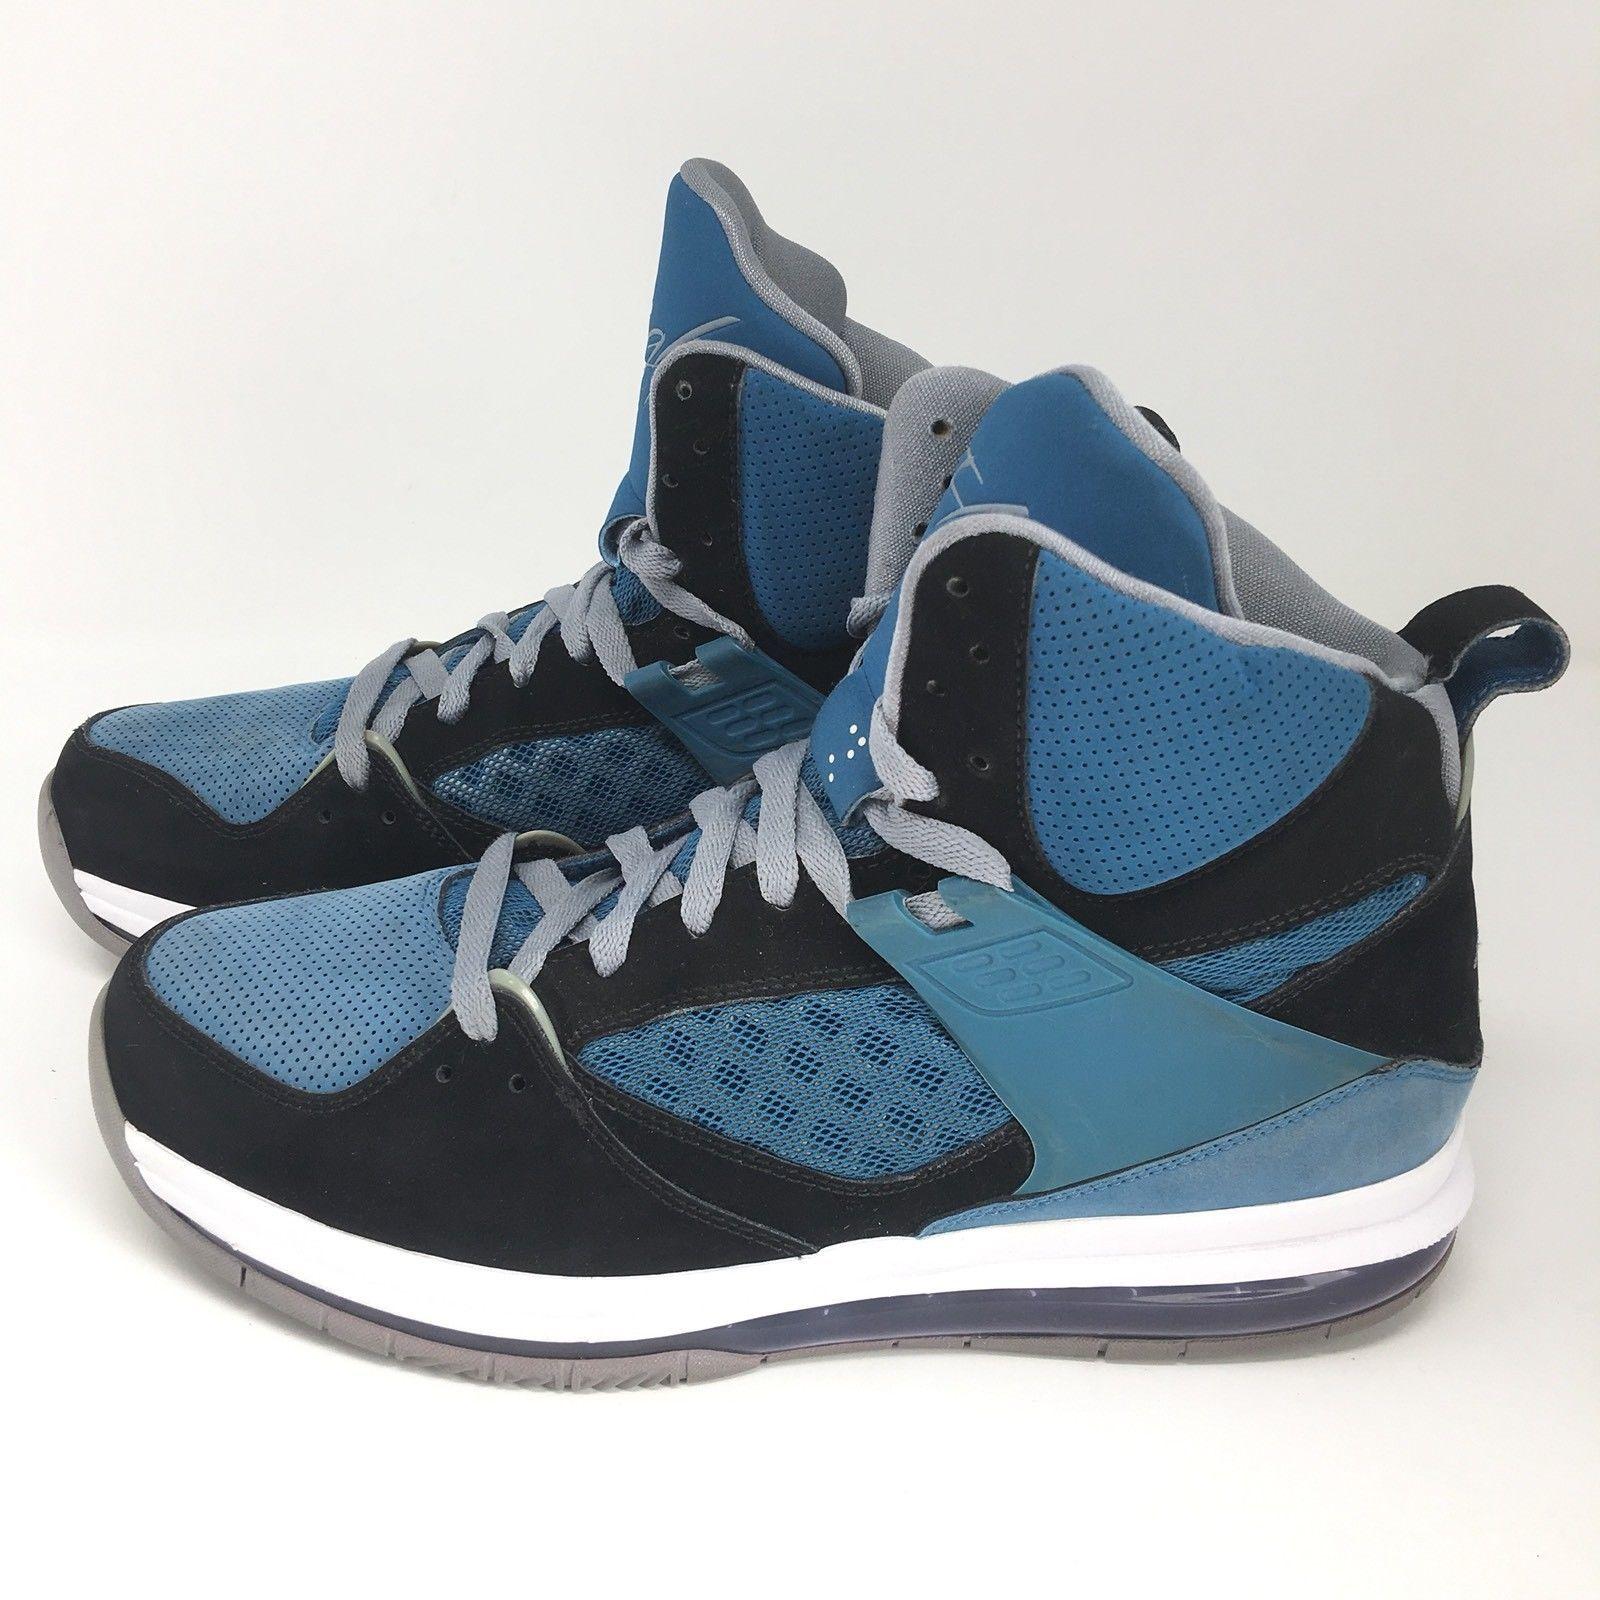 size 40 6417d 89f04 Nike Air Jordan Flight 45 Hi Max Dwayne Wade Basketball Shoes 524866-007 Size  9